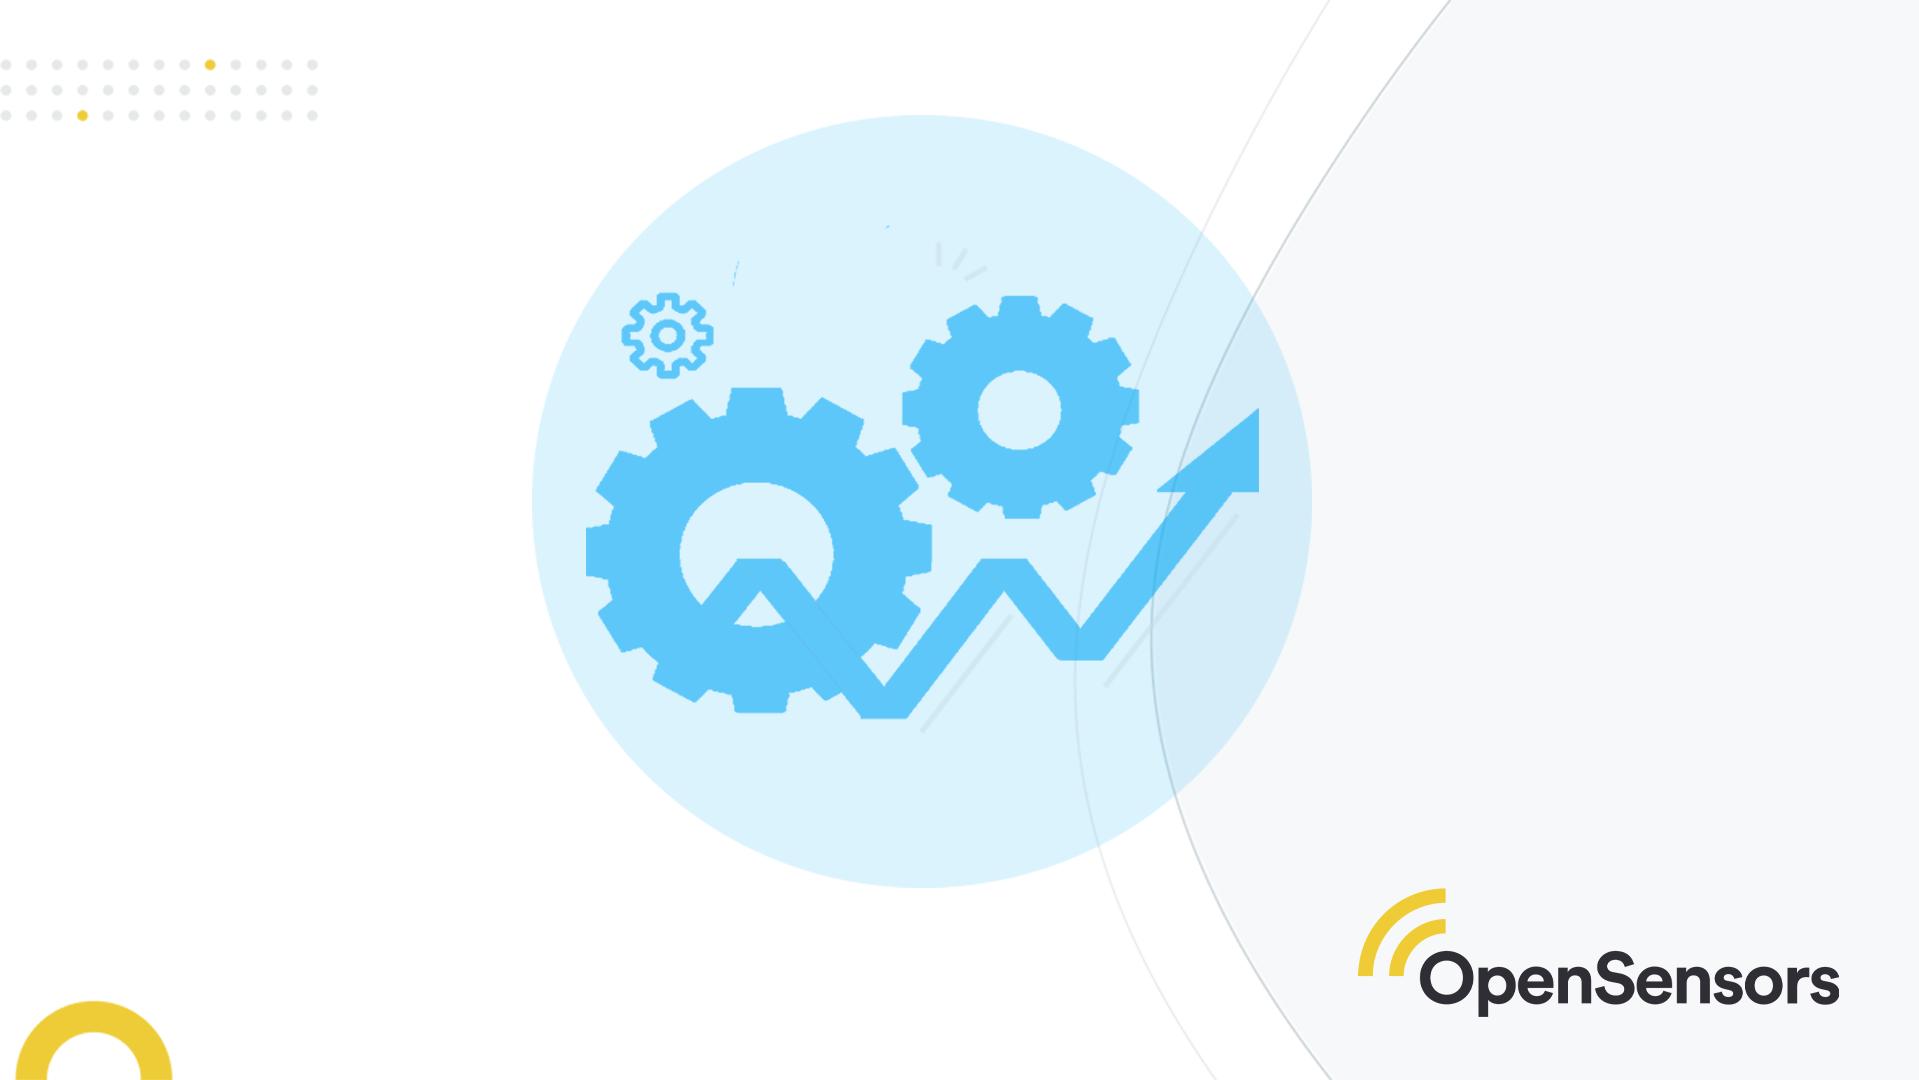 OpenSensors - workplace utilisation